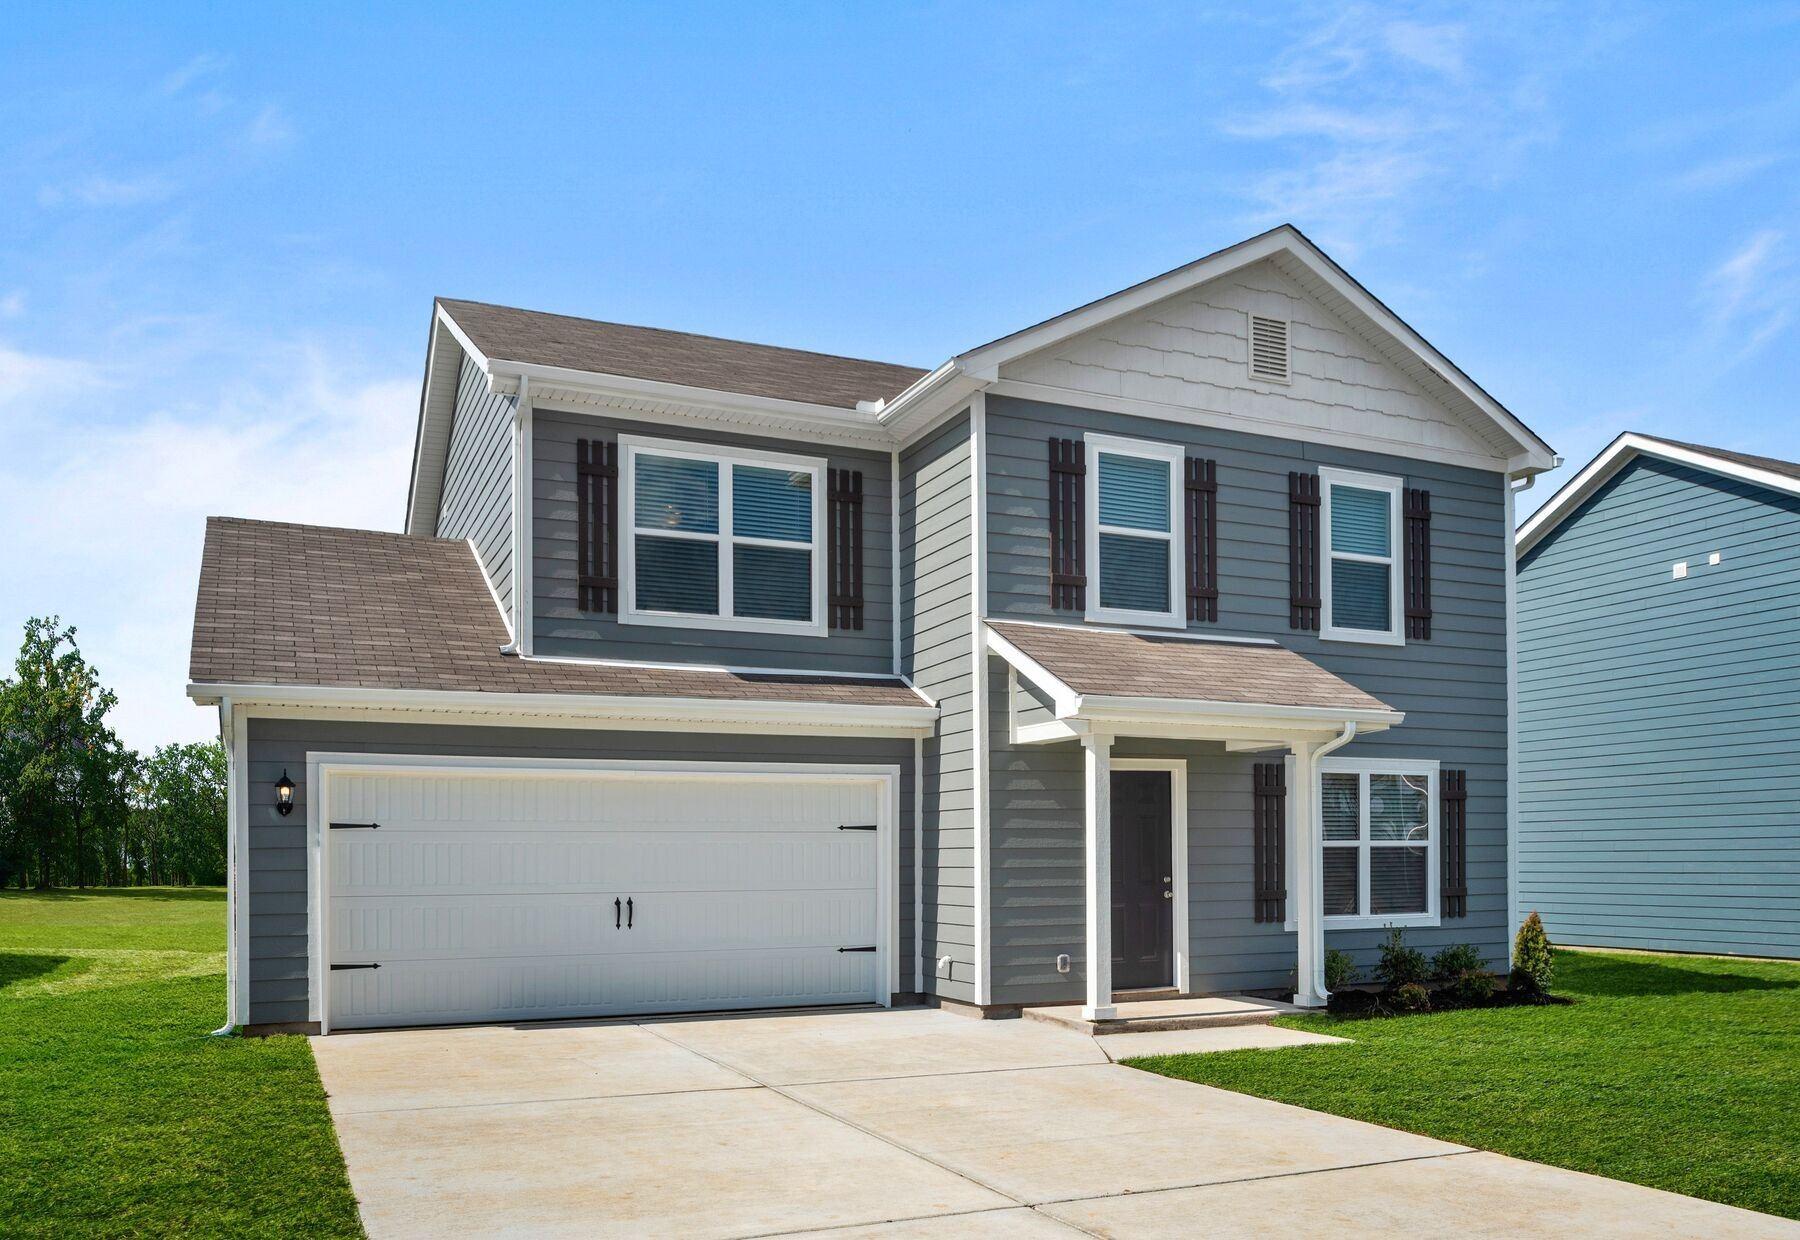 3511 Drysdale Dr, Murfreesboro, TN 37128 - MLS#: 2170520